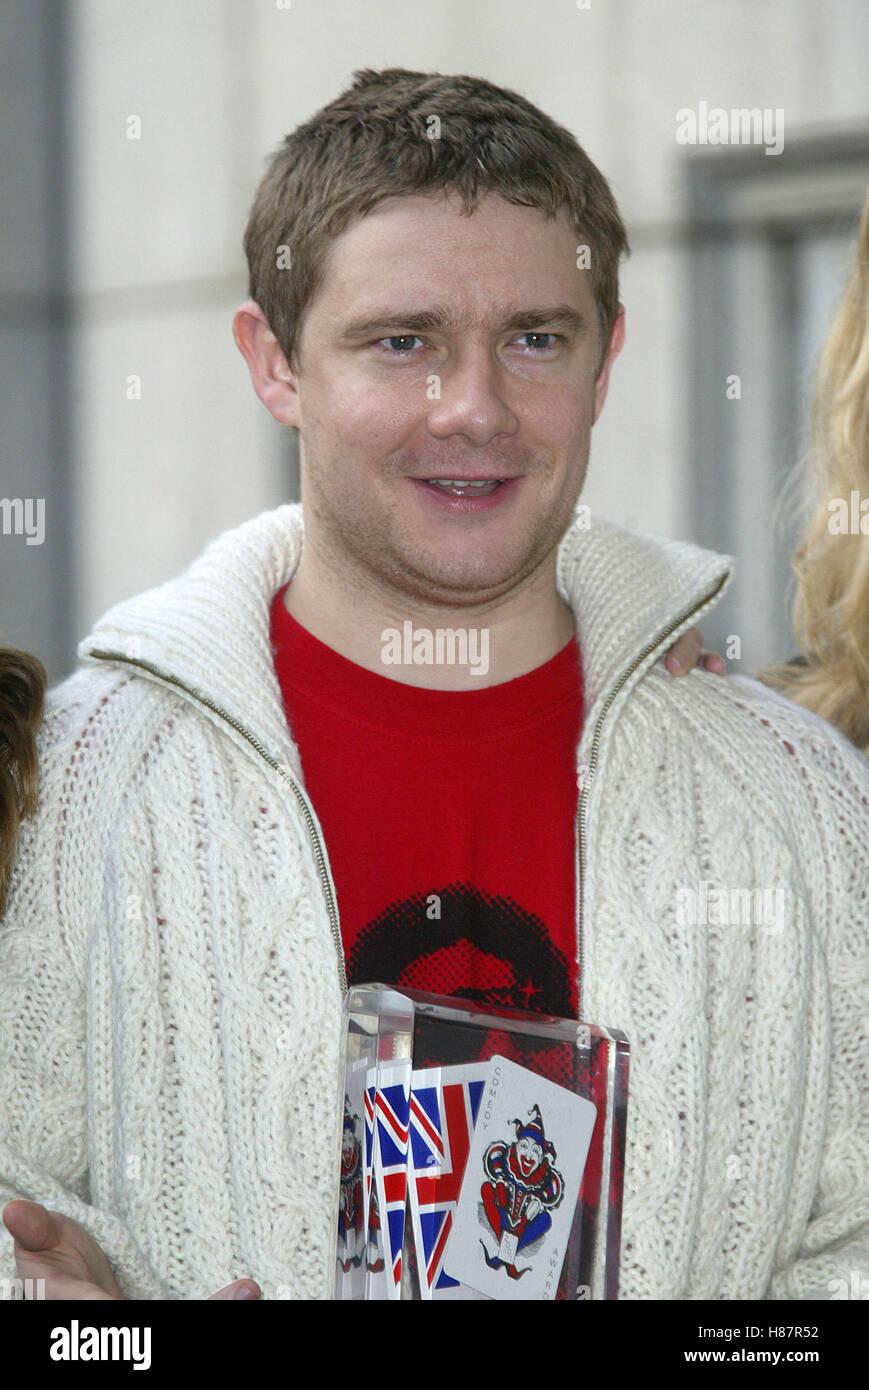 MARTIN FREEMAN COMEDY AWARDS NOMINEES 2003 SAVOY HOTEL LONDON ENGLAND 12 November 2003 - Stock Image